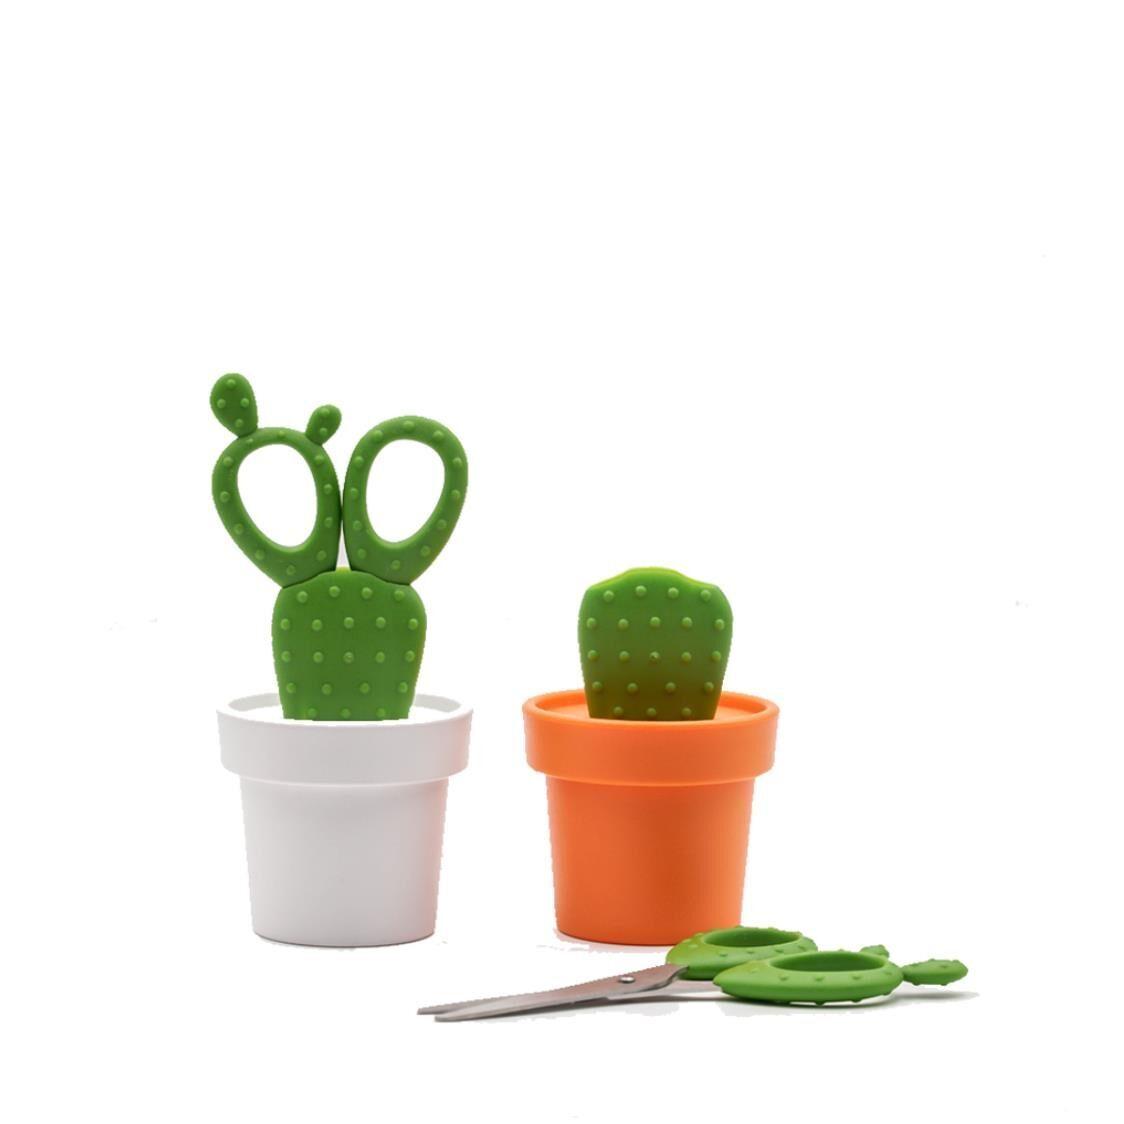 Qualy Cactus Scissors White and Green